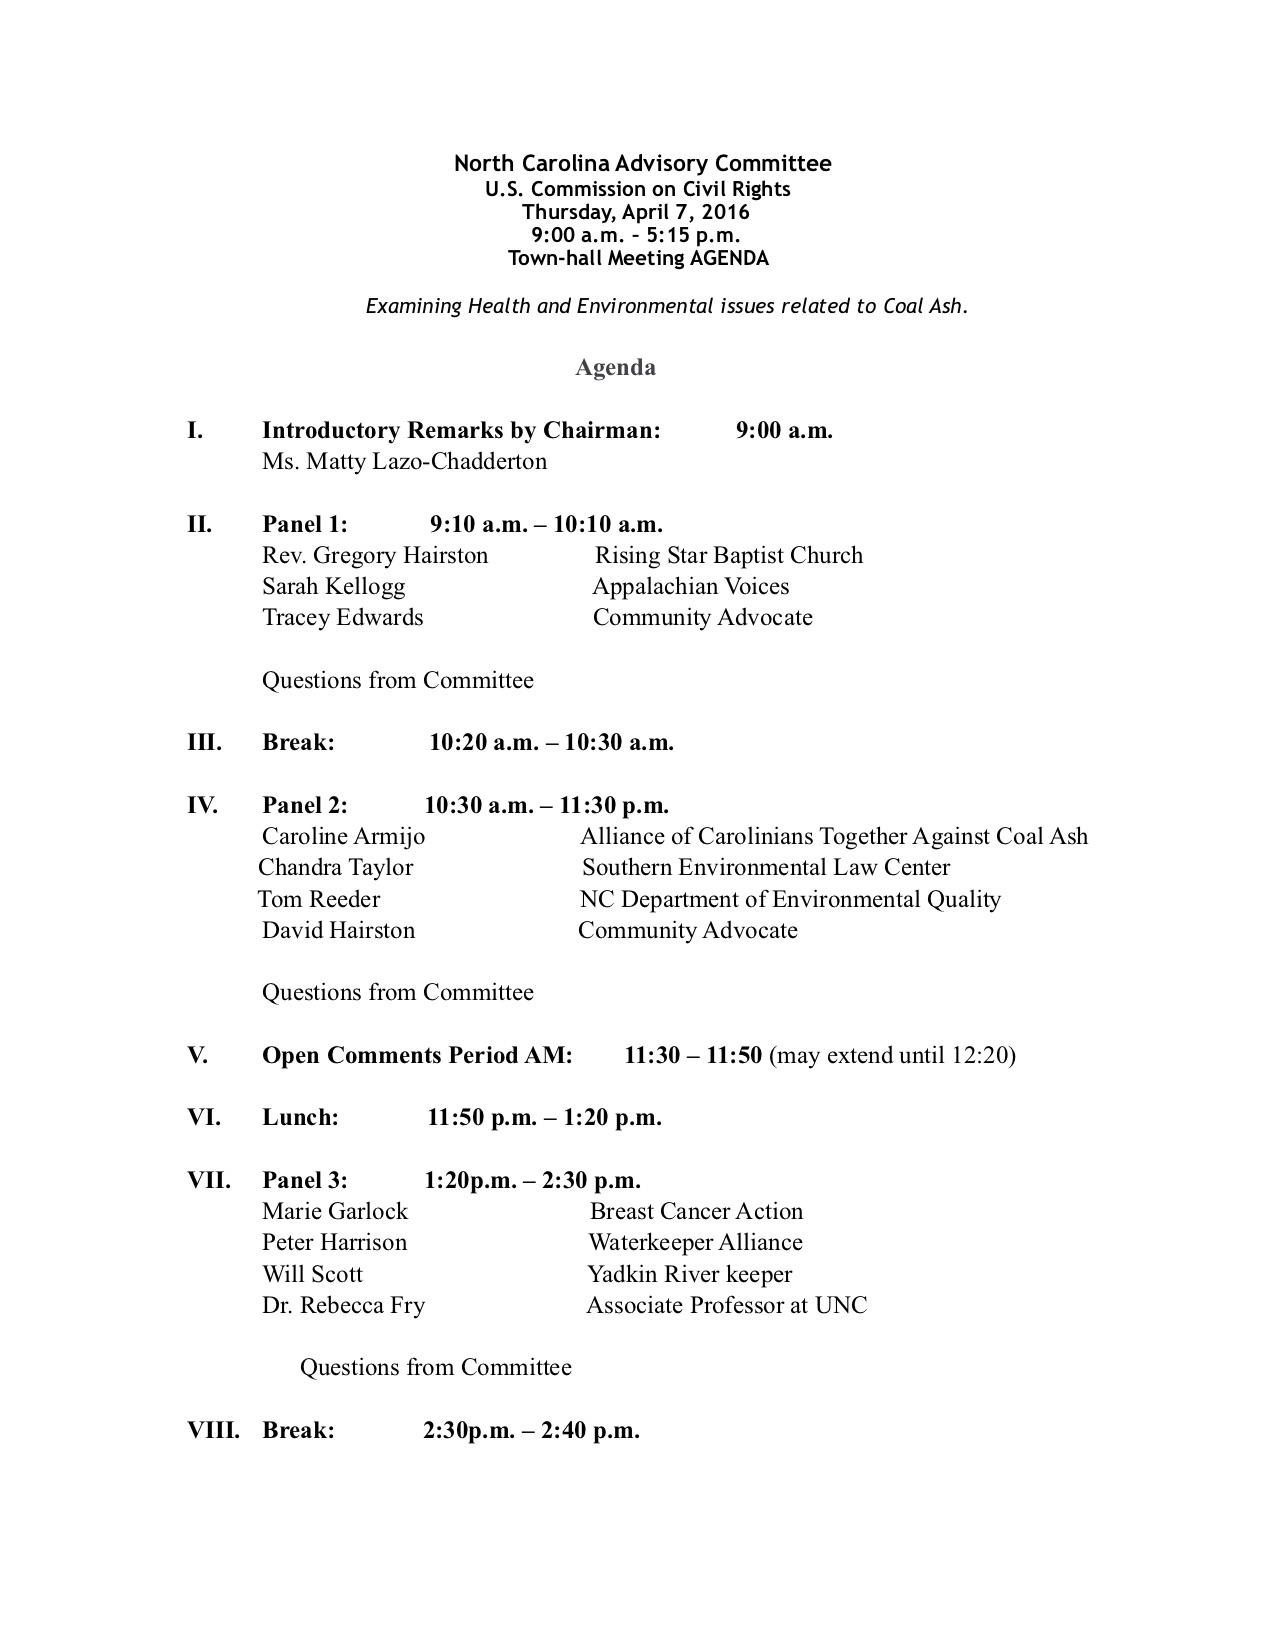 Agenda Layout (Final) USCCR.jpg